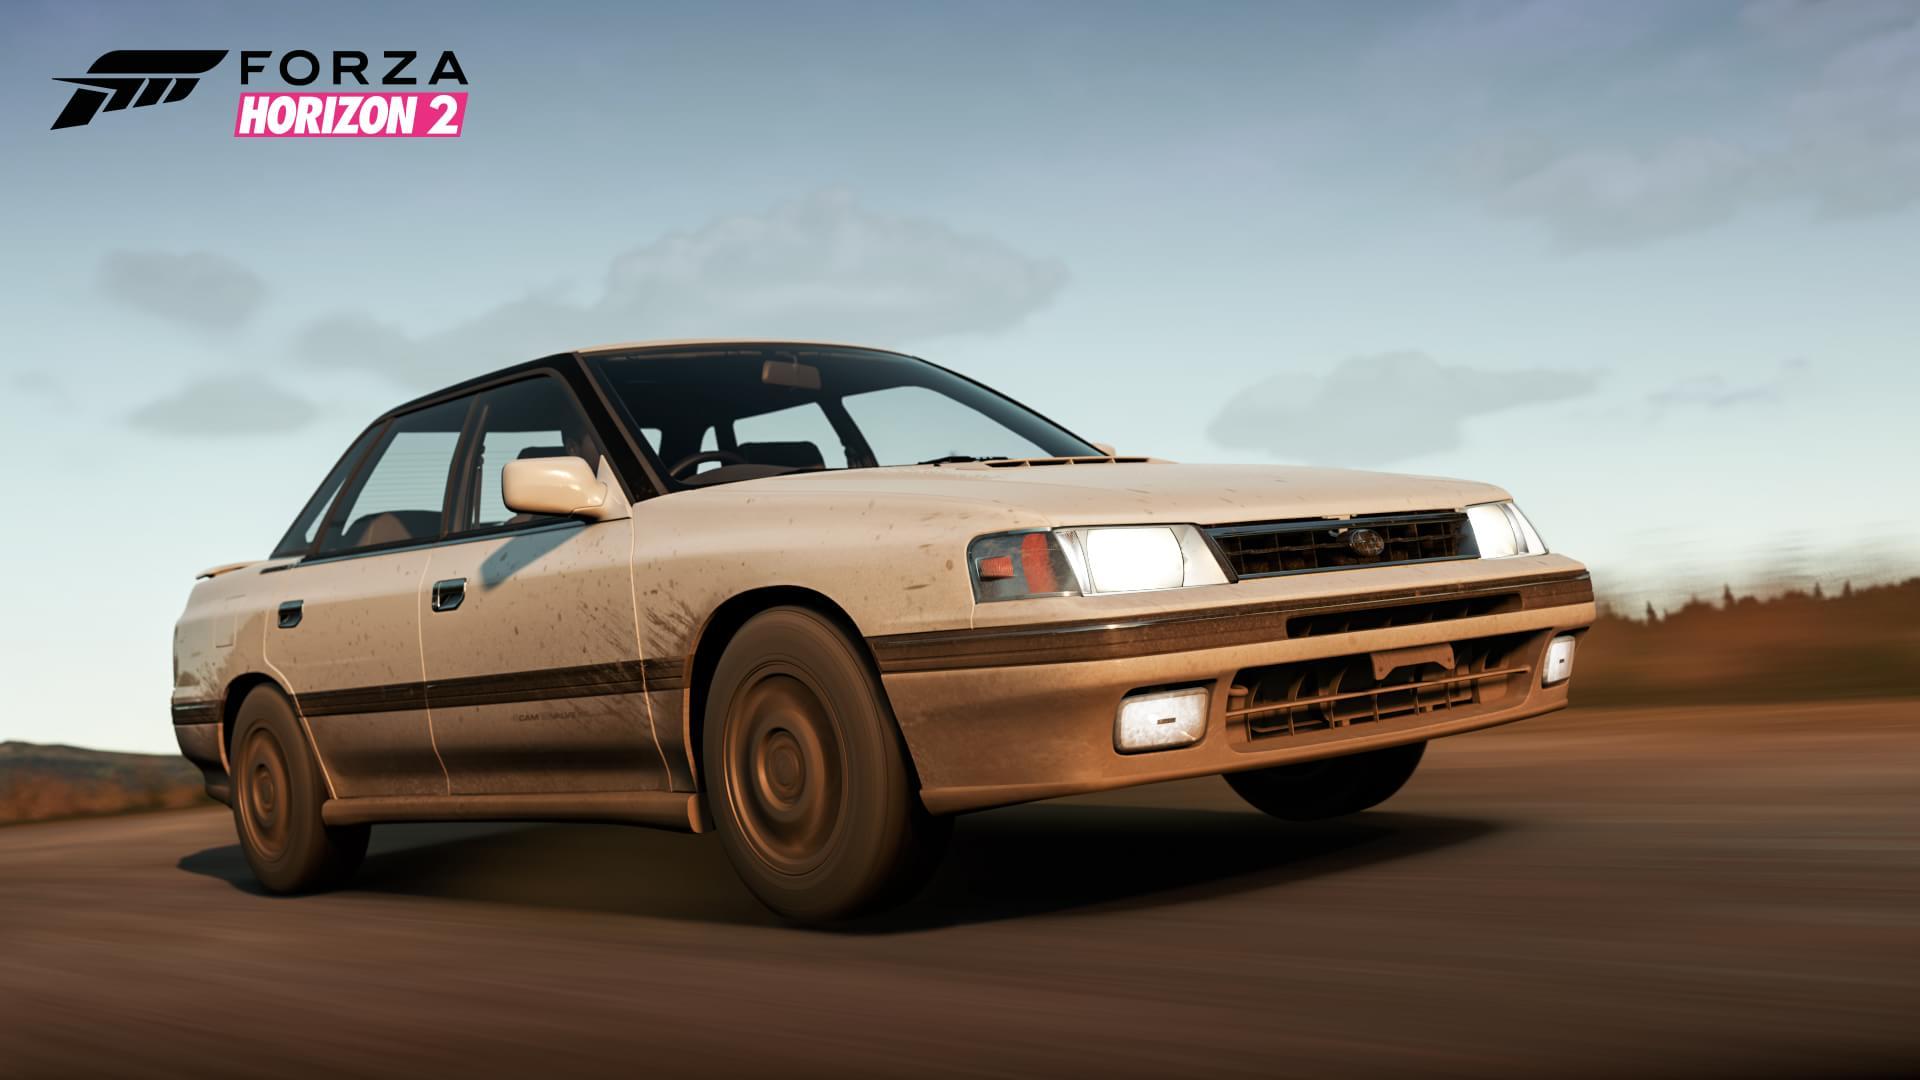 Pacote Falken, de Forza Horizon 2, traz Subaru Legacy RS 1990 de graça